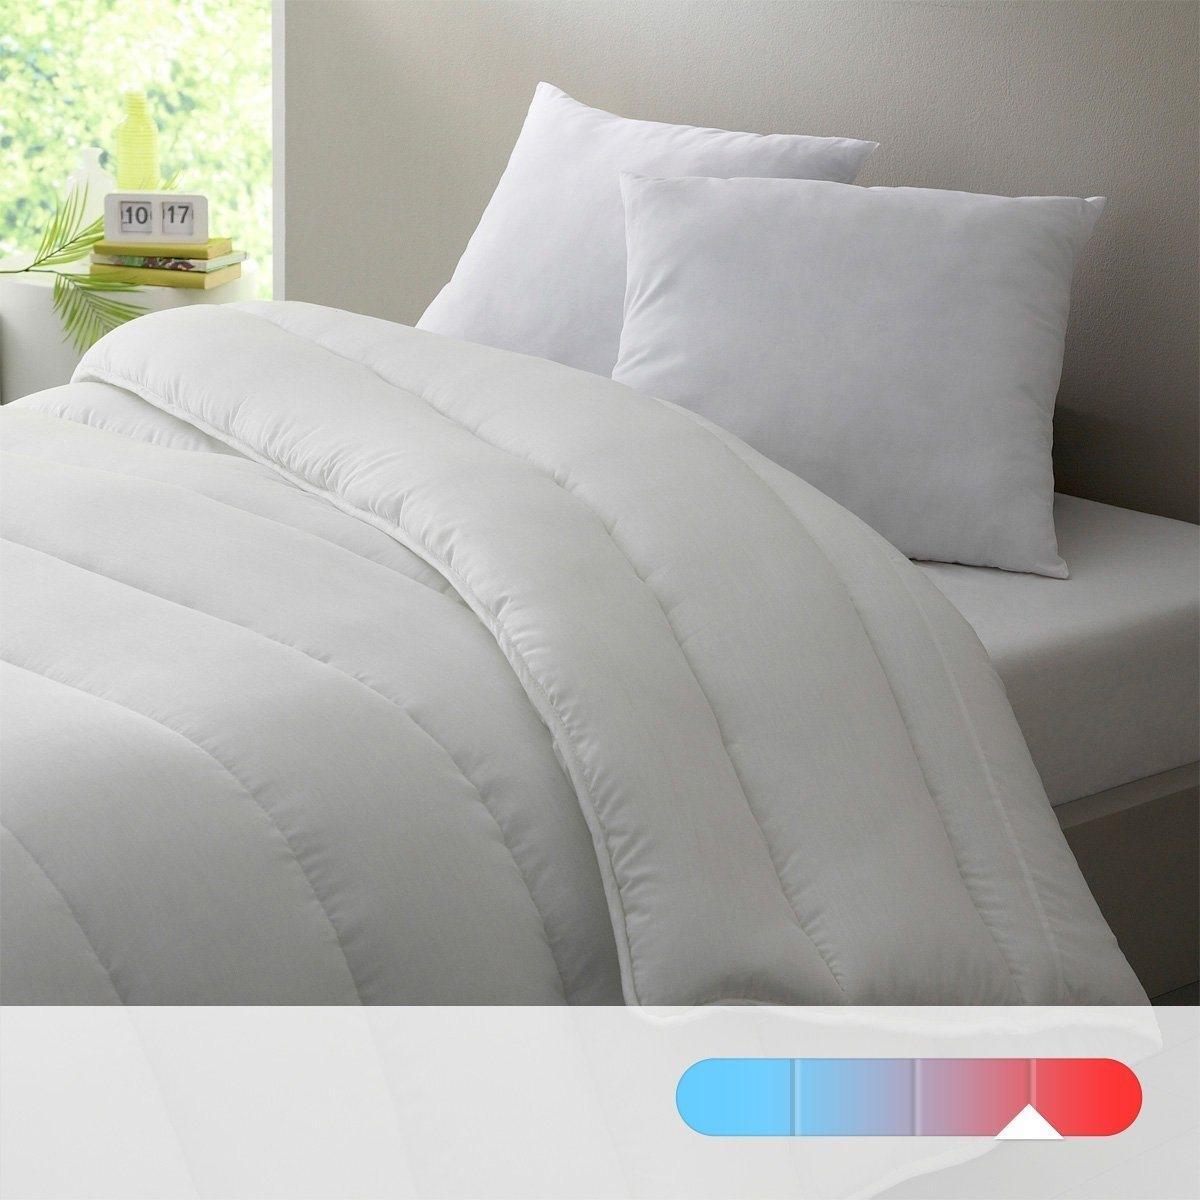 купить Oдеяло La Redoute LA REDOUTE CREATION гм 240 x 220 см белый по цене 6949 рублей